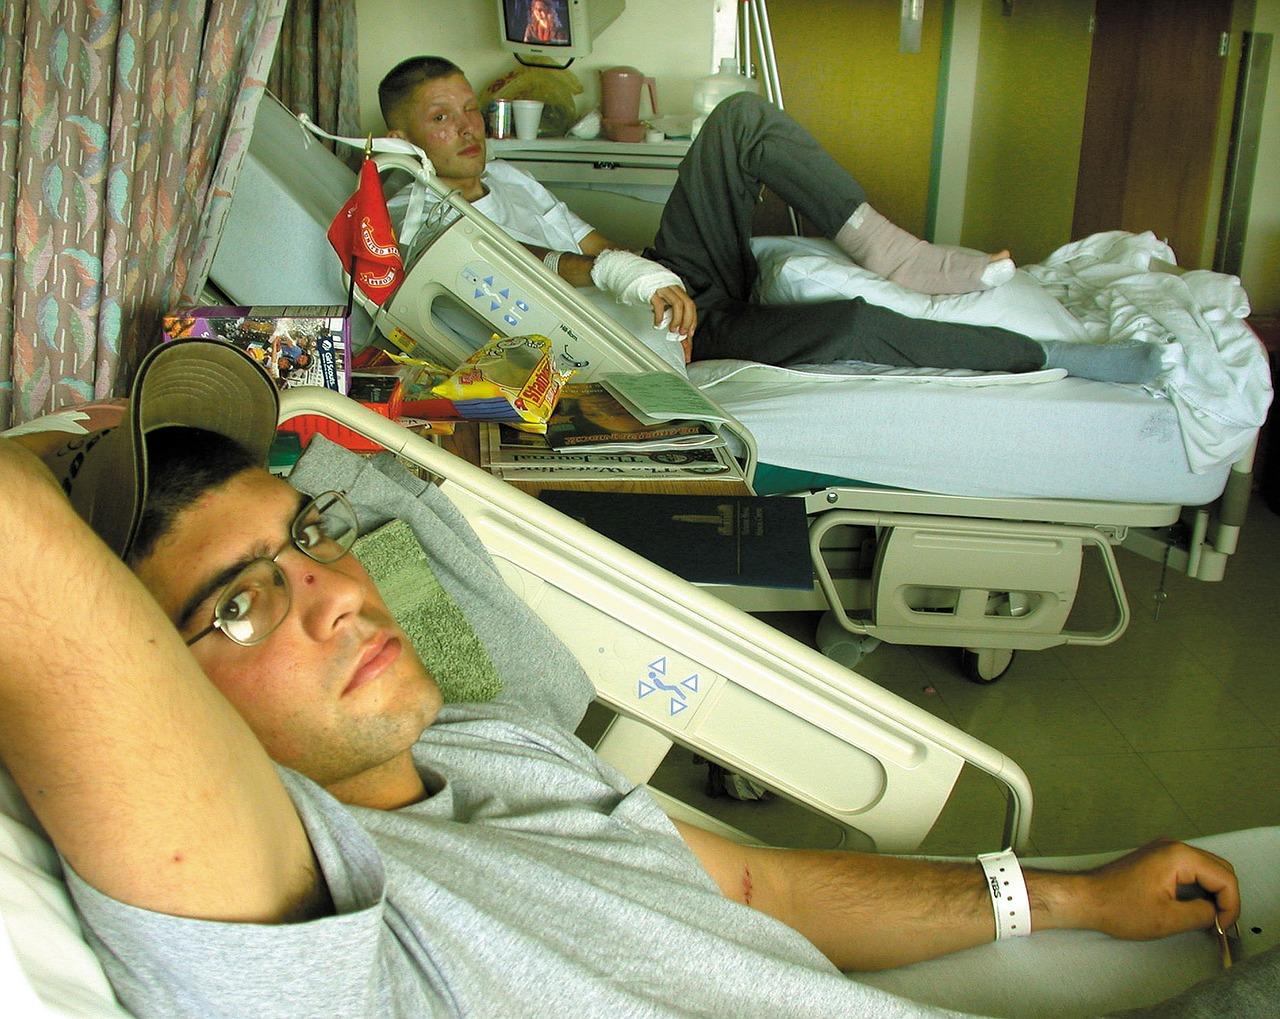 bethesda-naval-hospital-80363_1280